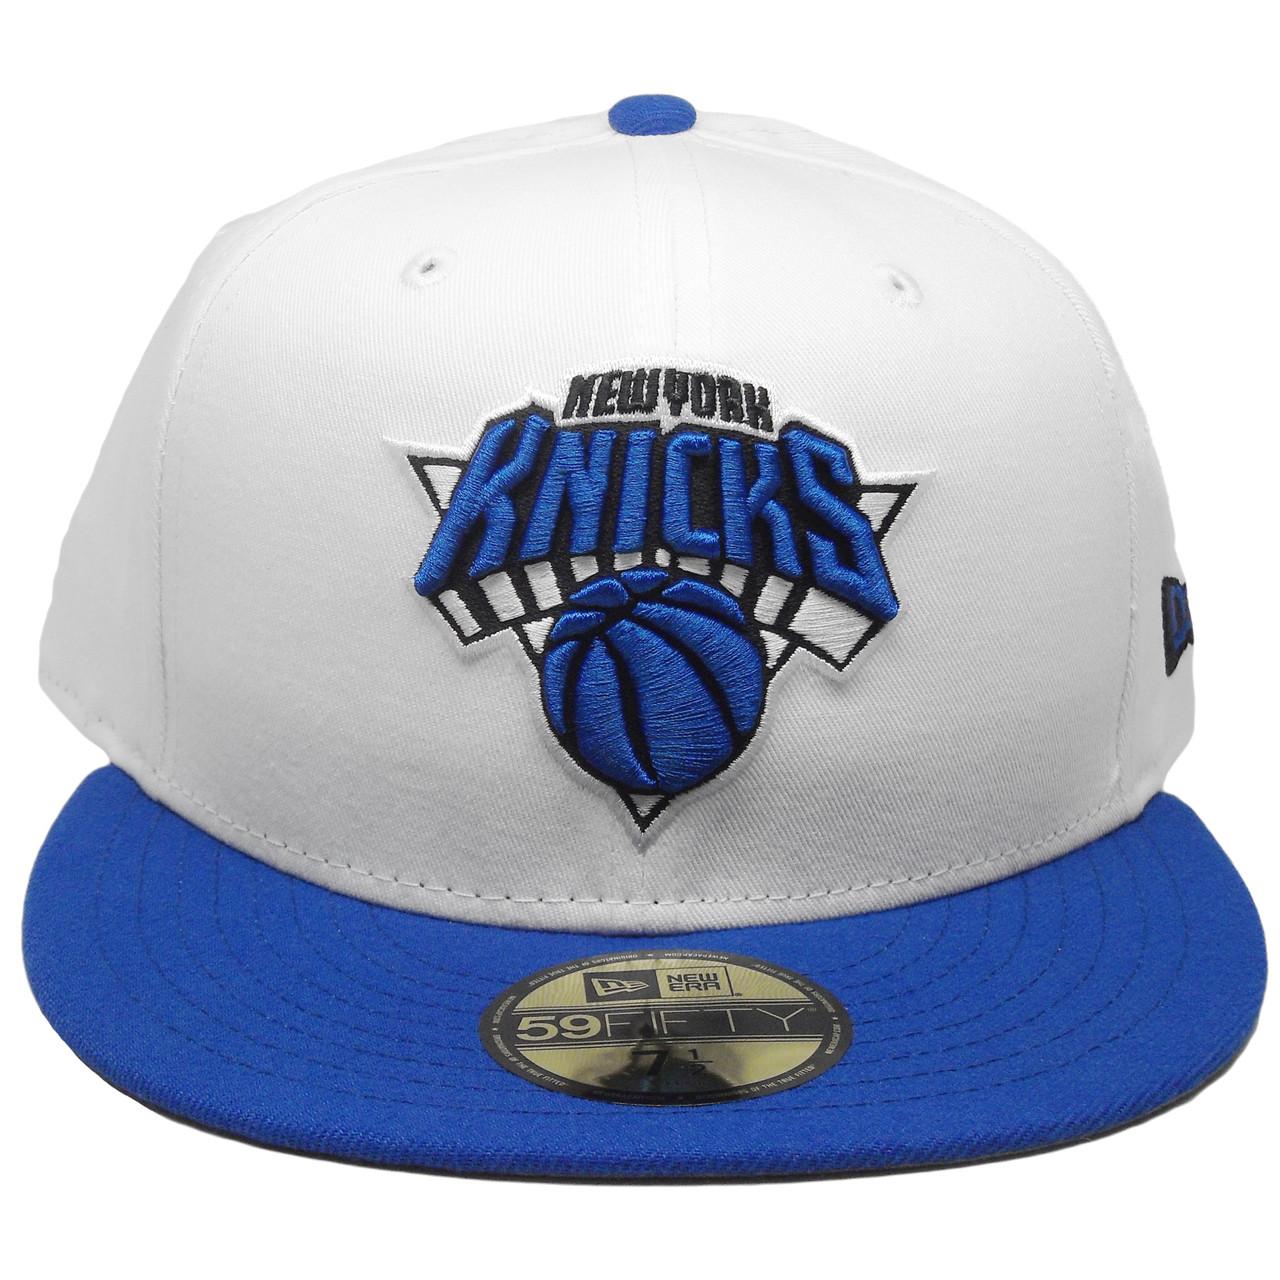 fdb4f207539 New York Knicks Custom New Era 59Fifty Fitted Hat - White